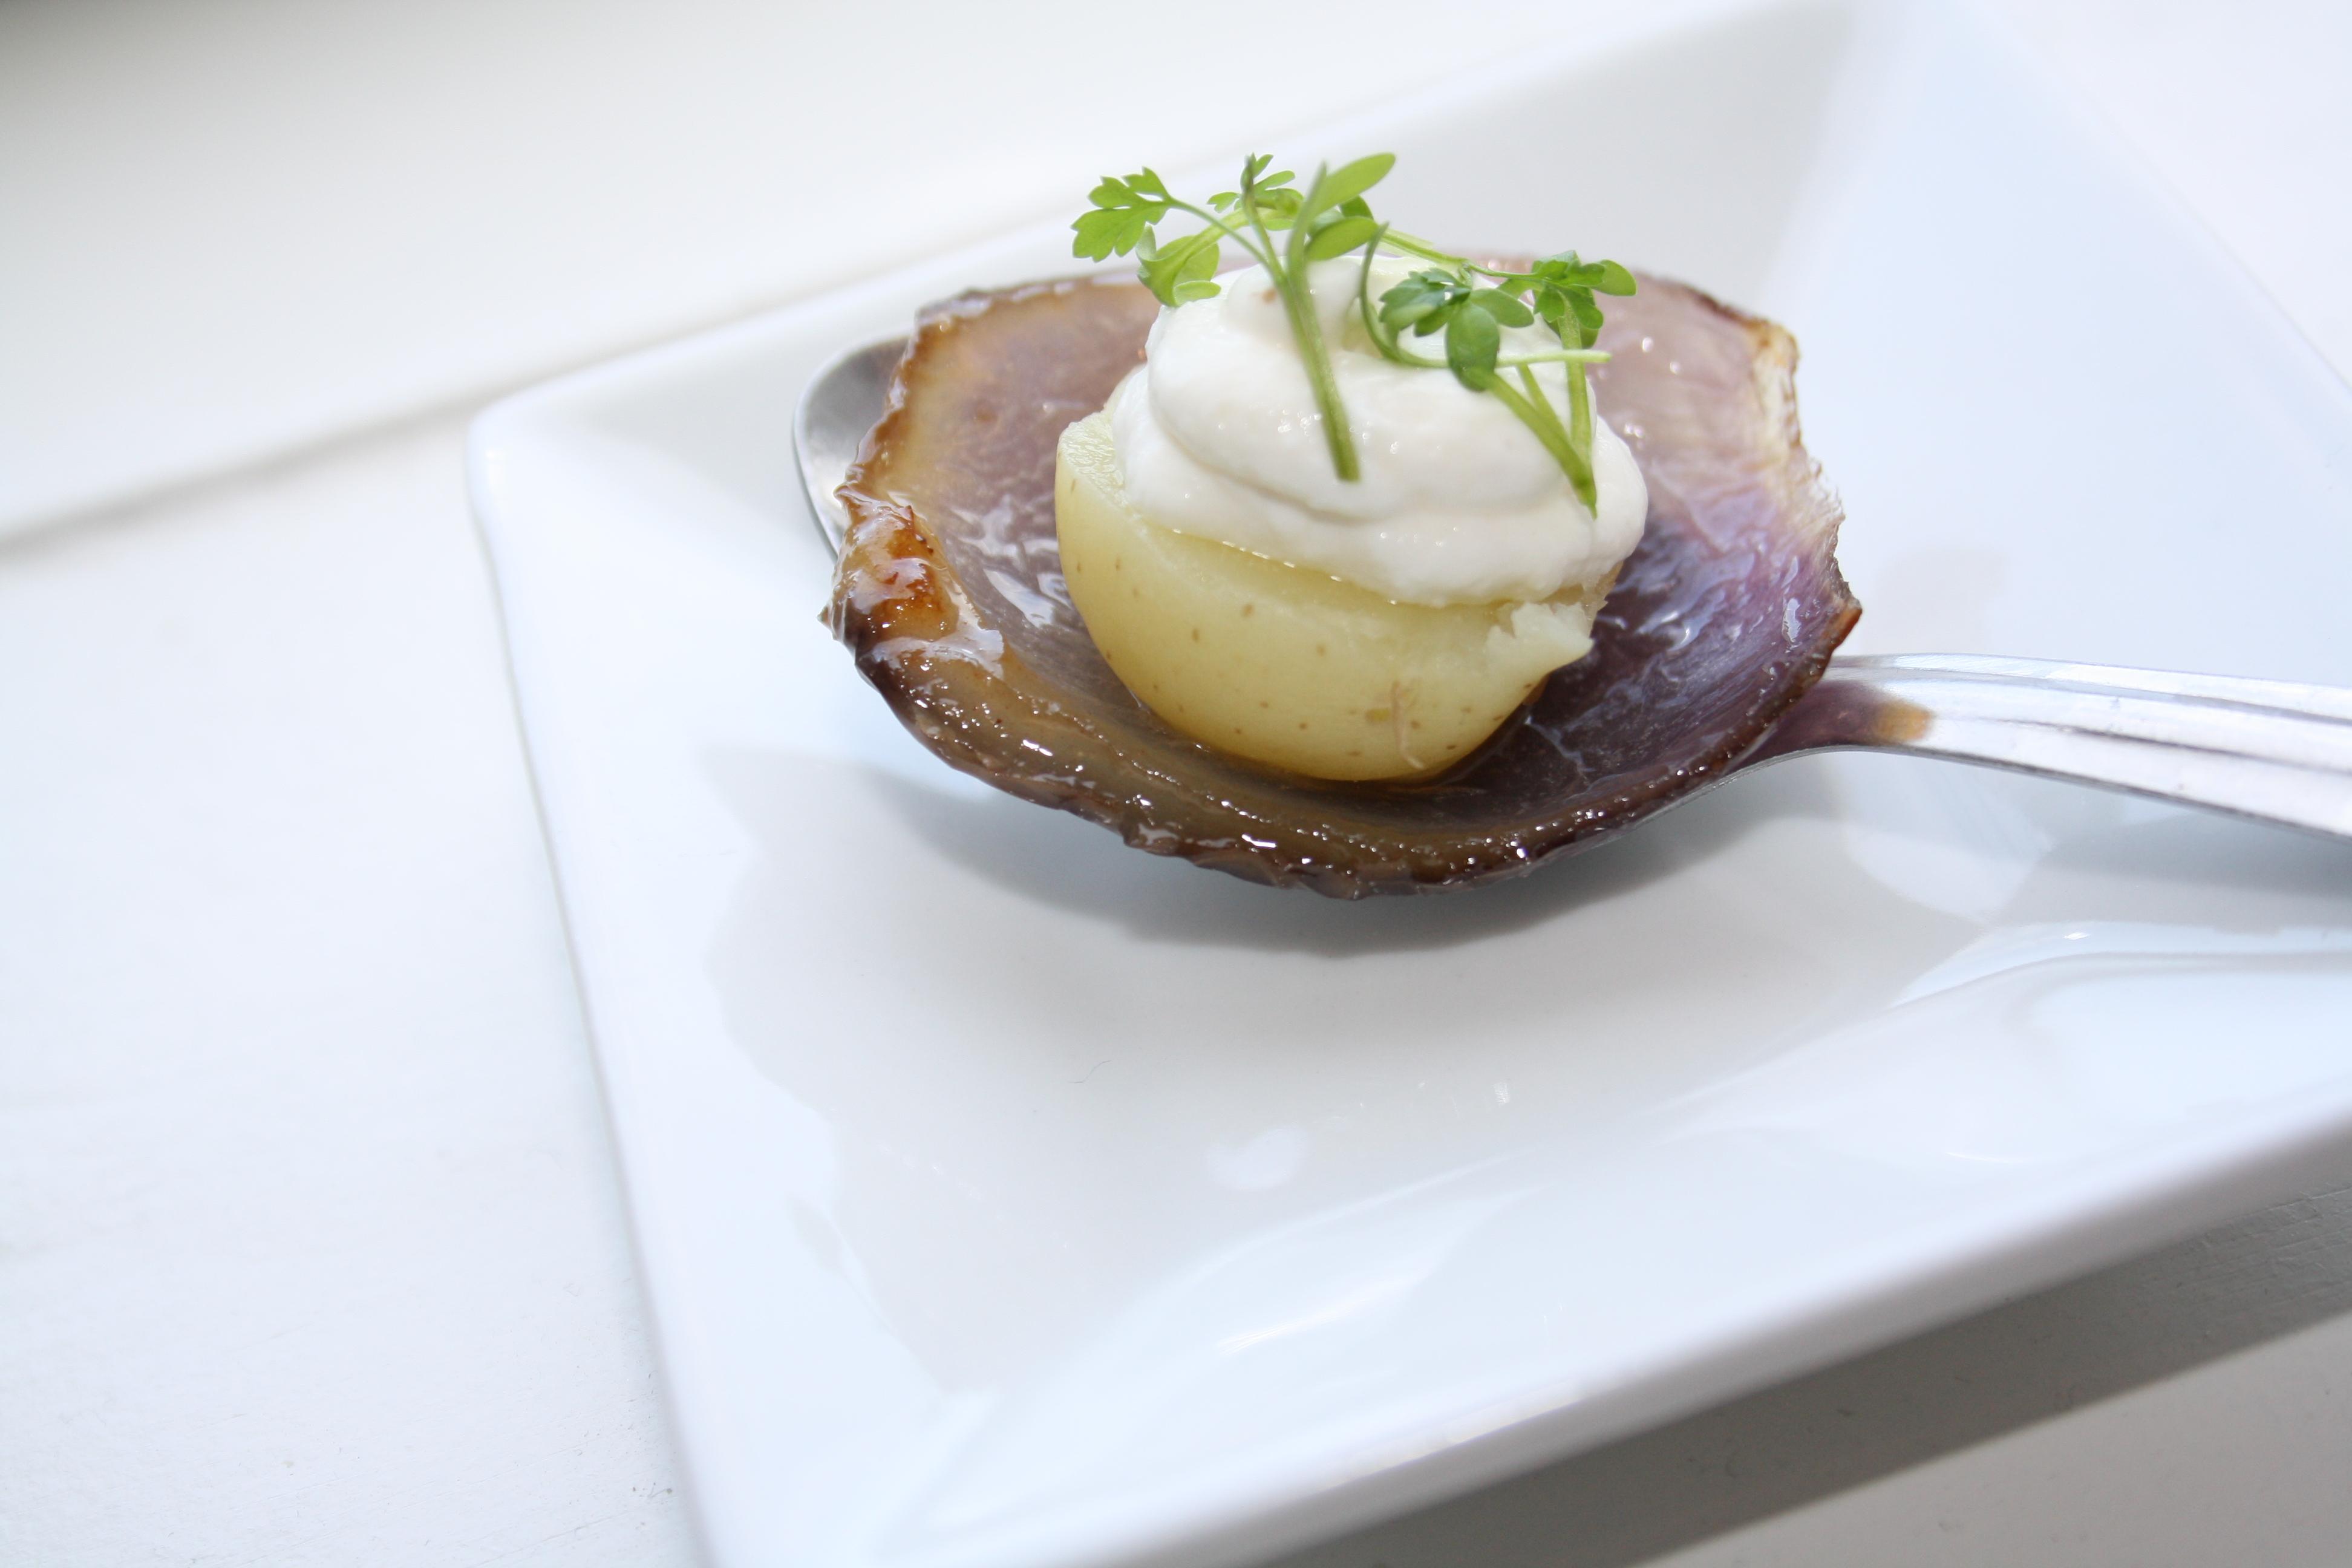 Fynsk Forårstapas Ii Nye Små Kartofler Søde Rødløg Rygeostcreme